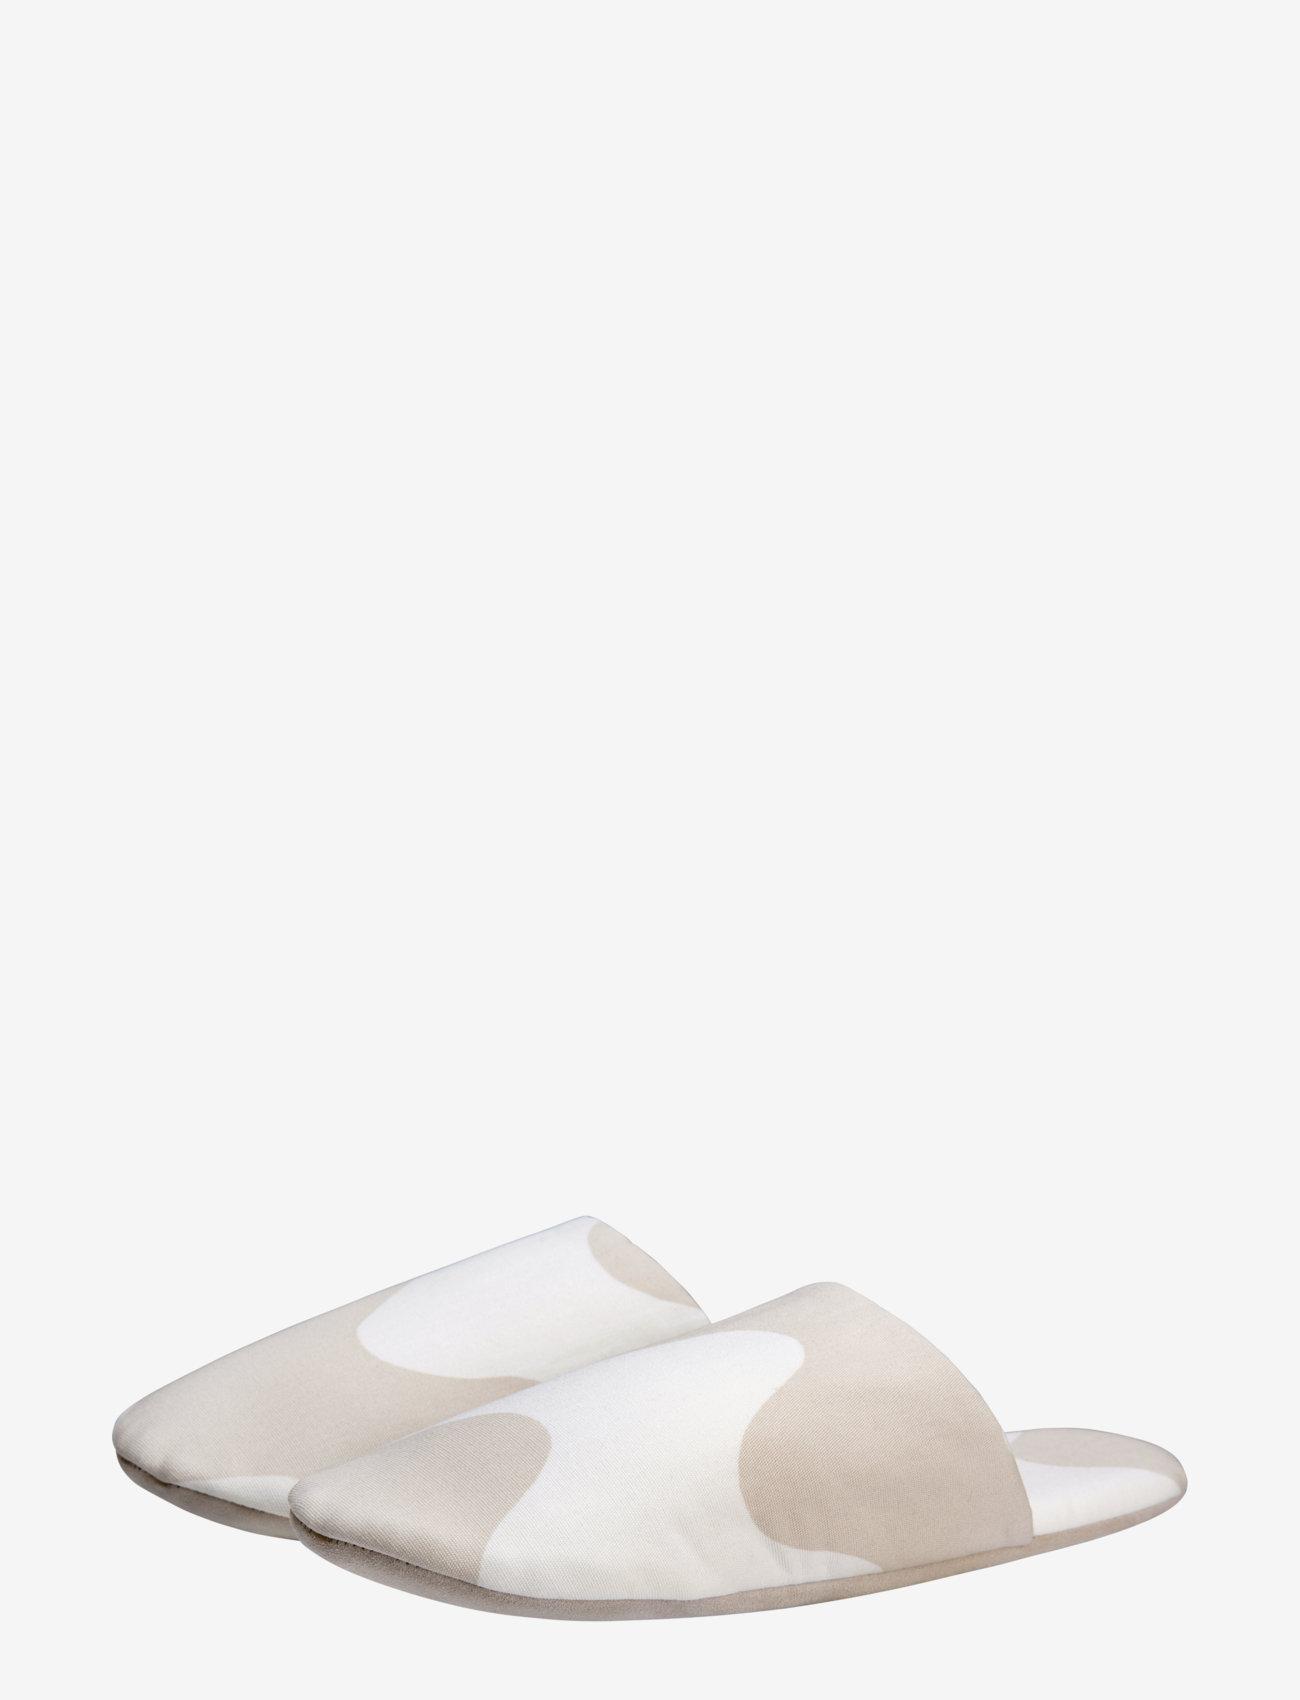 Marimekko Home - LOKKI SLIPPERS - tossut - white, beige - 1